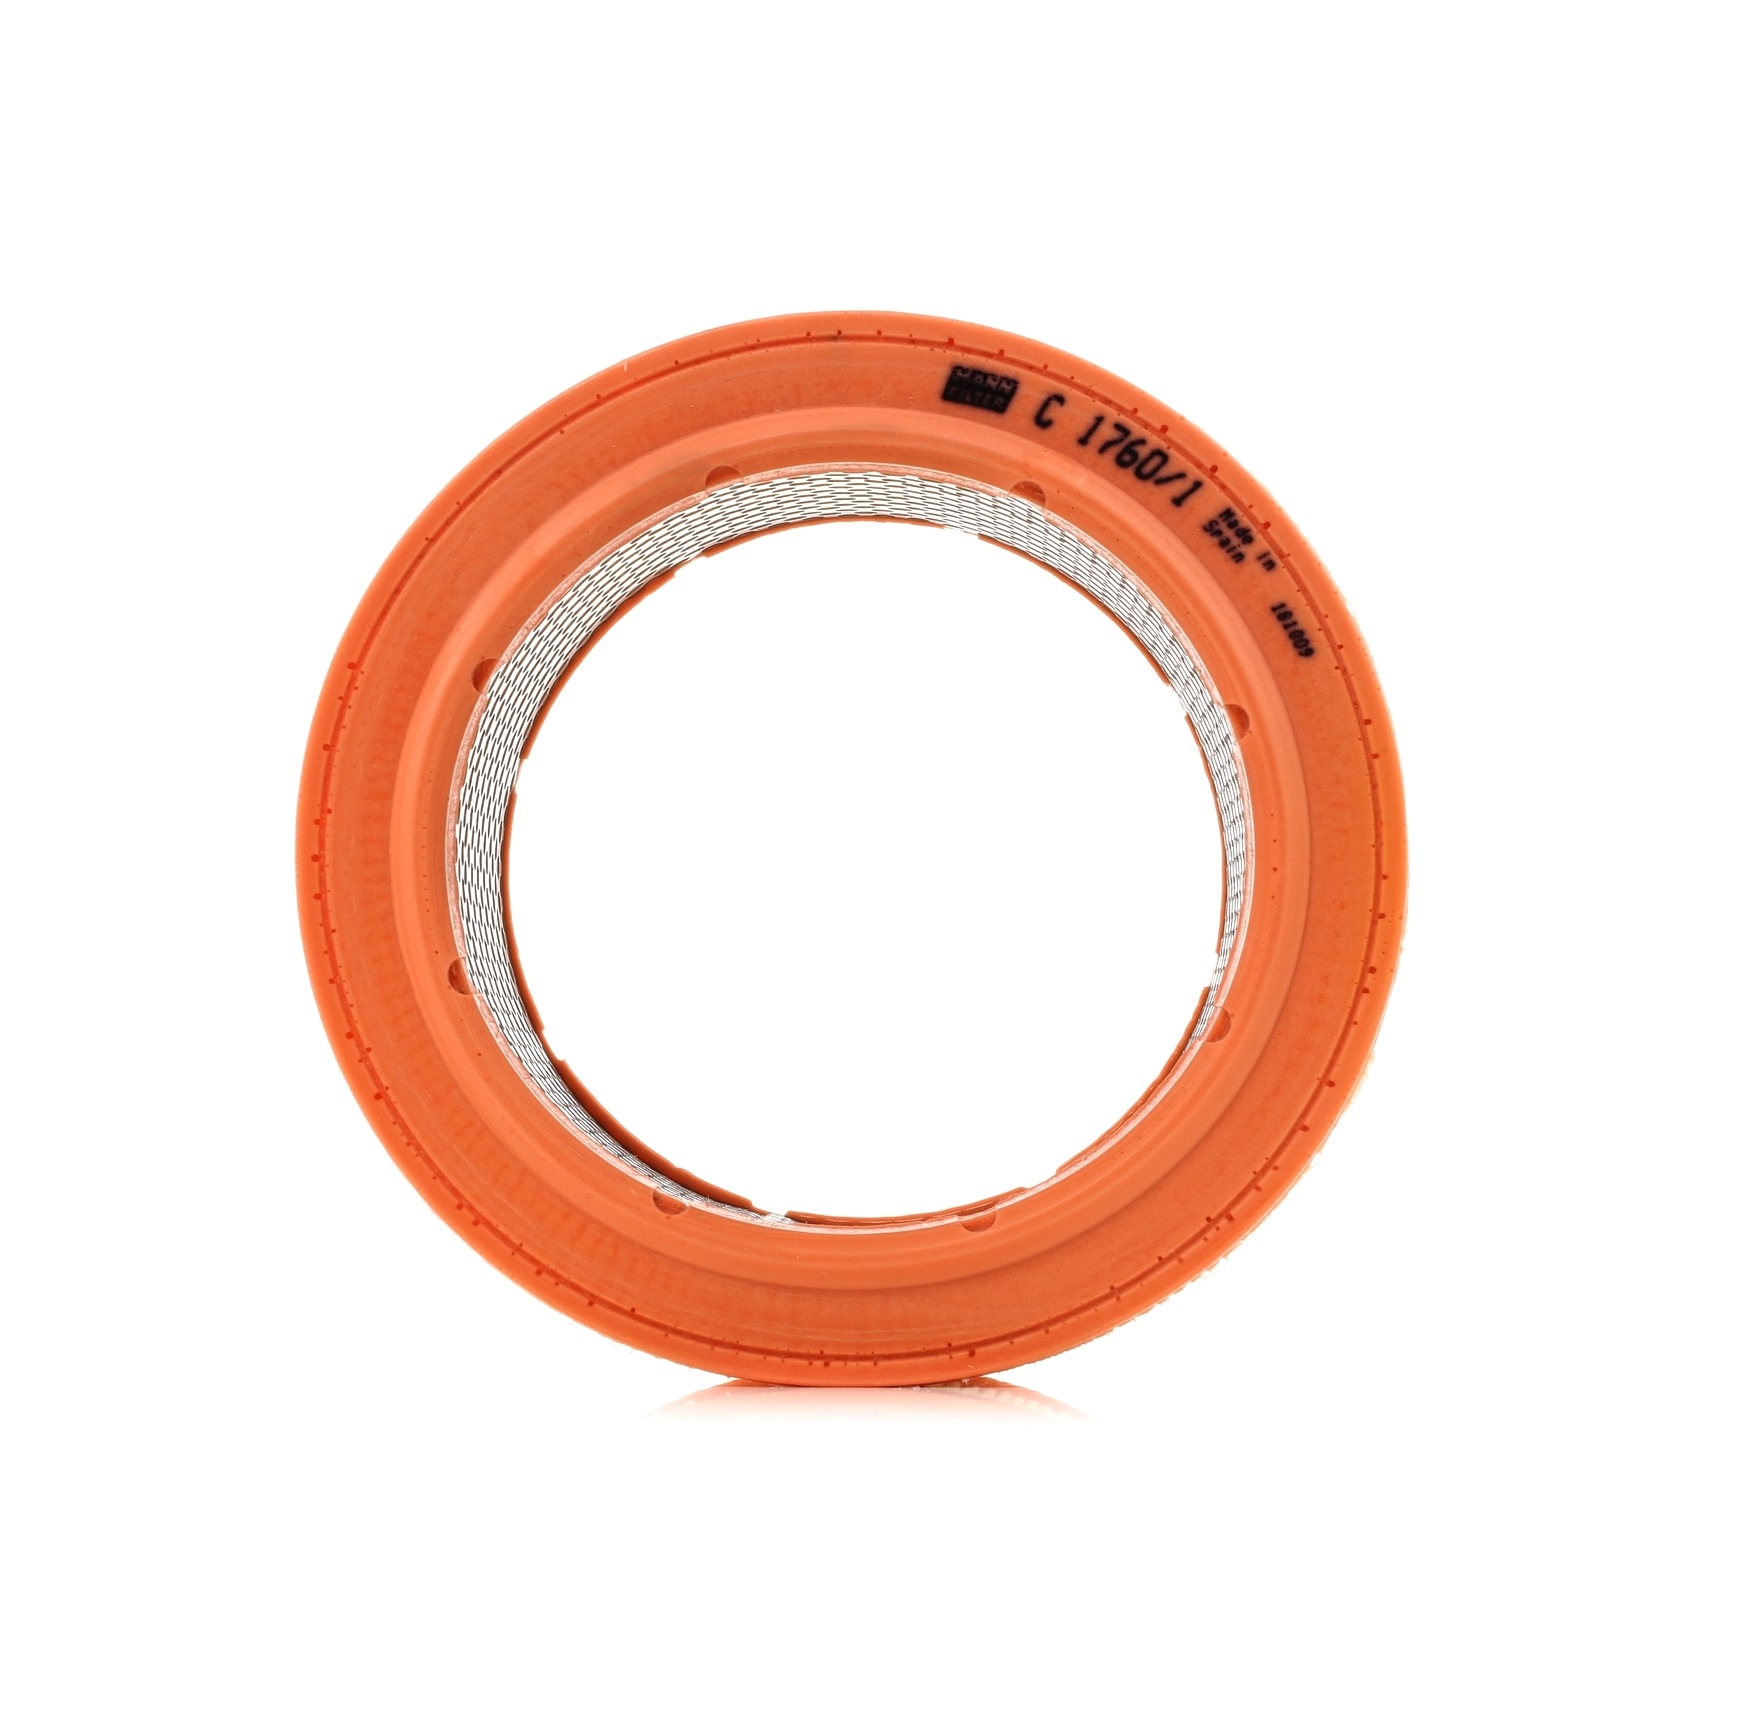 Zracni filter C 1760/1 MANN-FILTER - samo novi deli